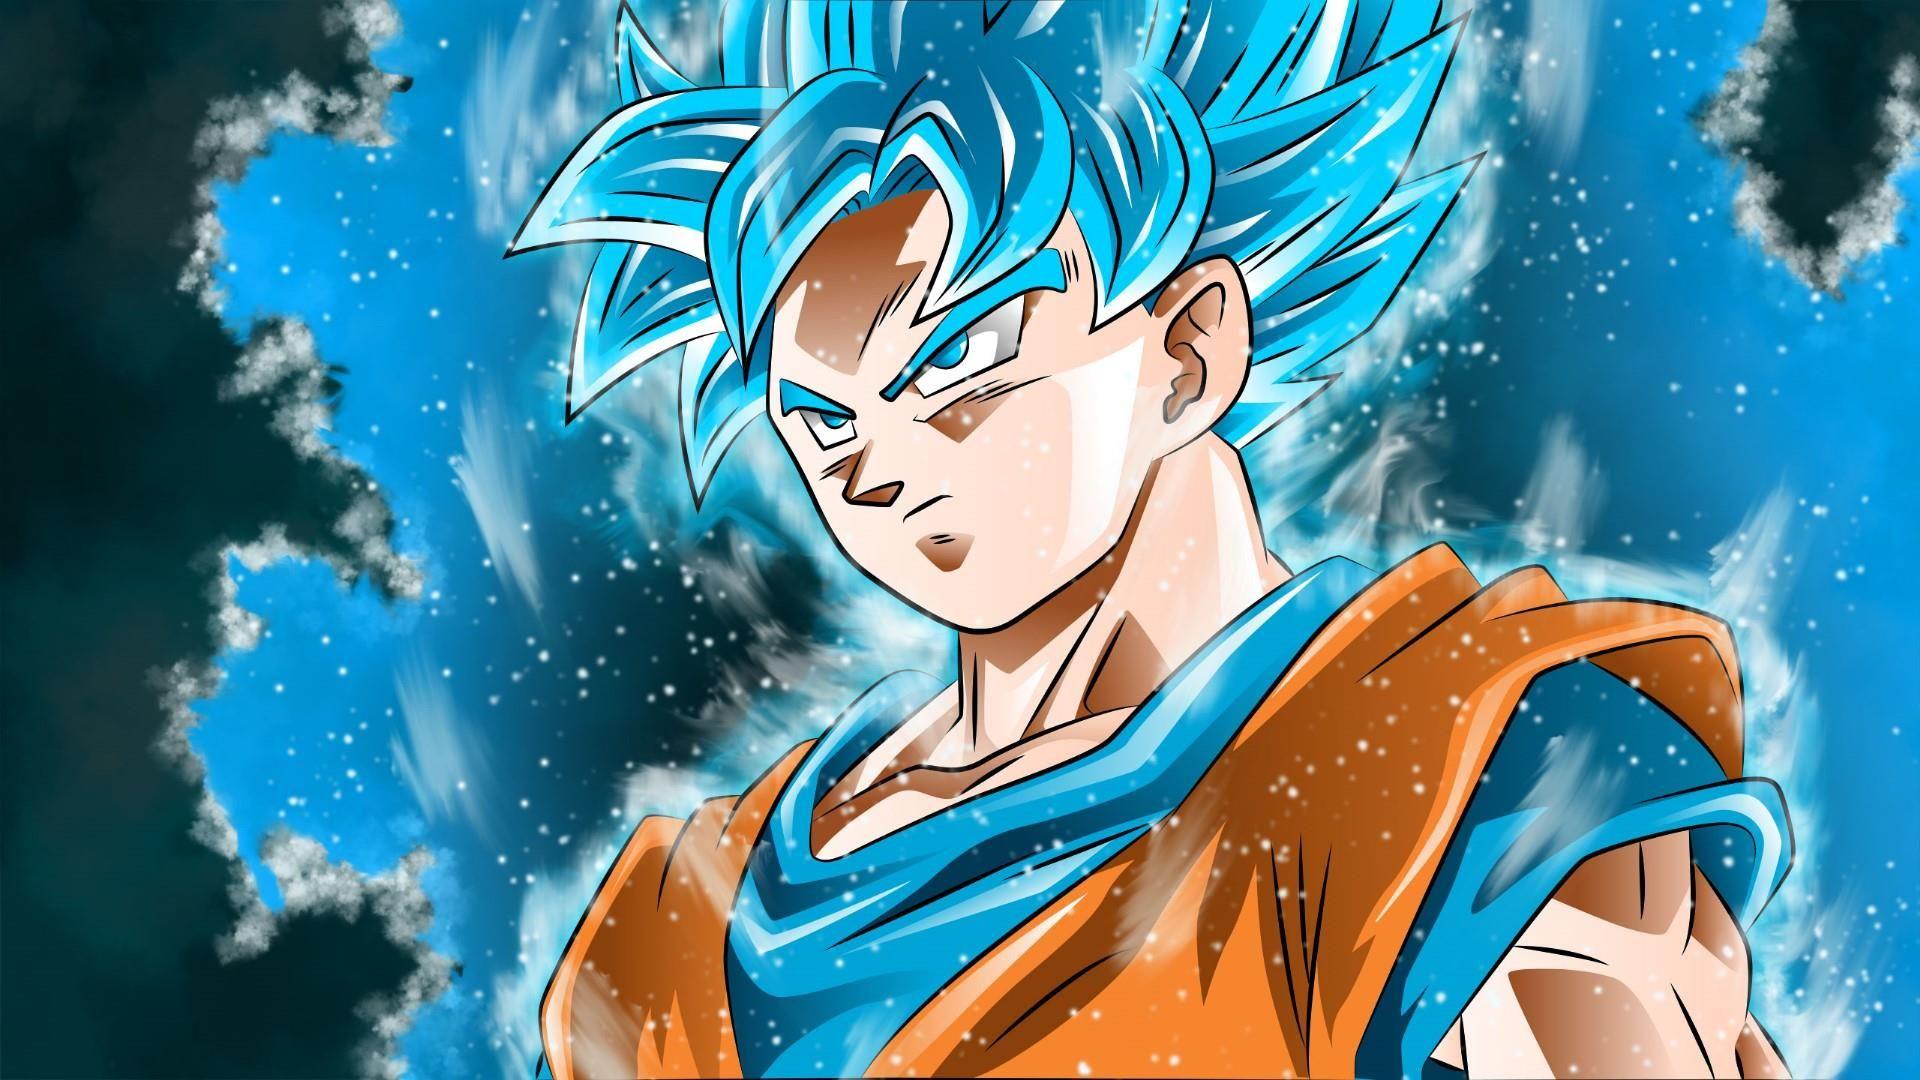 Dragon Ball Z Hashtags: Blue Goku Wallpaper 3 - 1920 X 1080